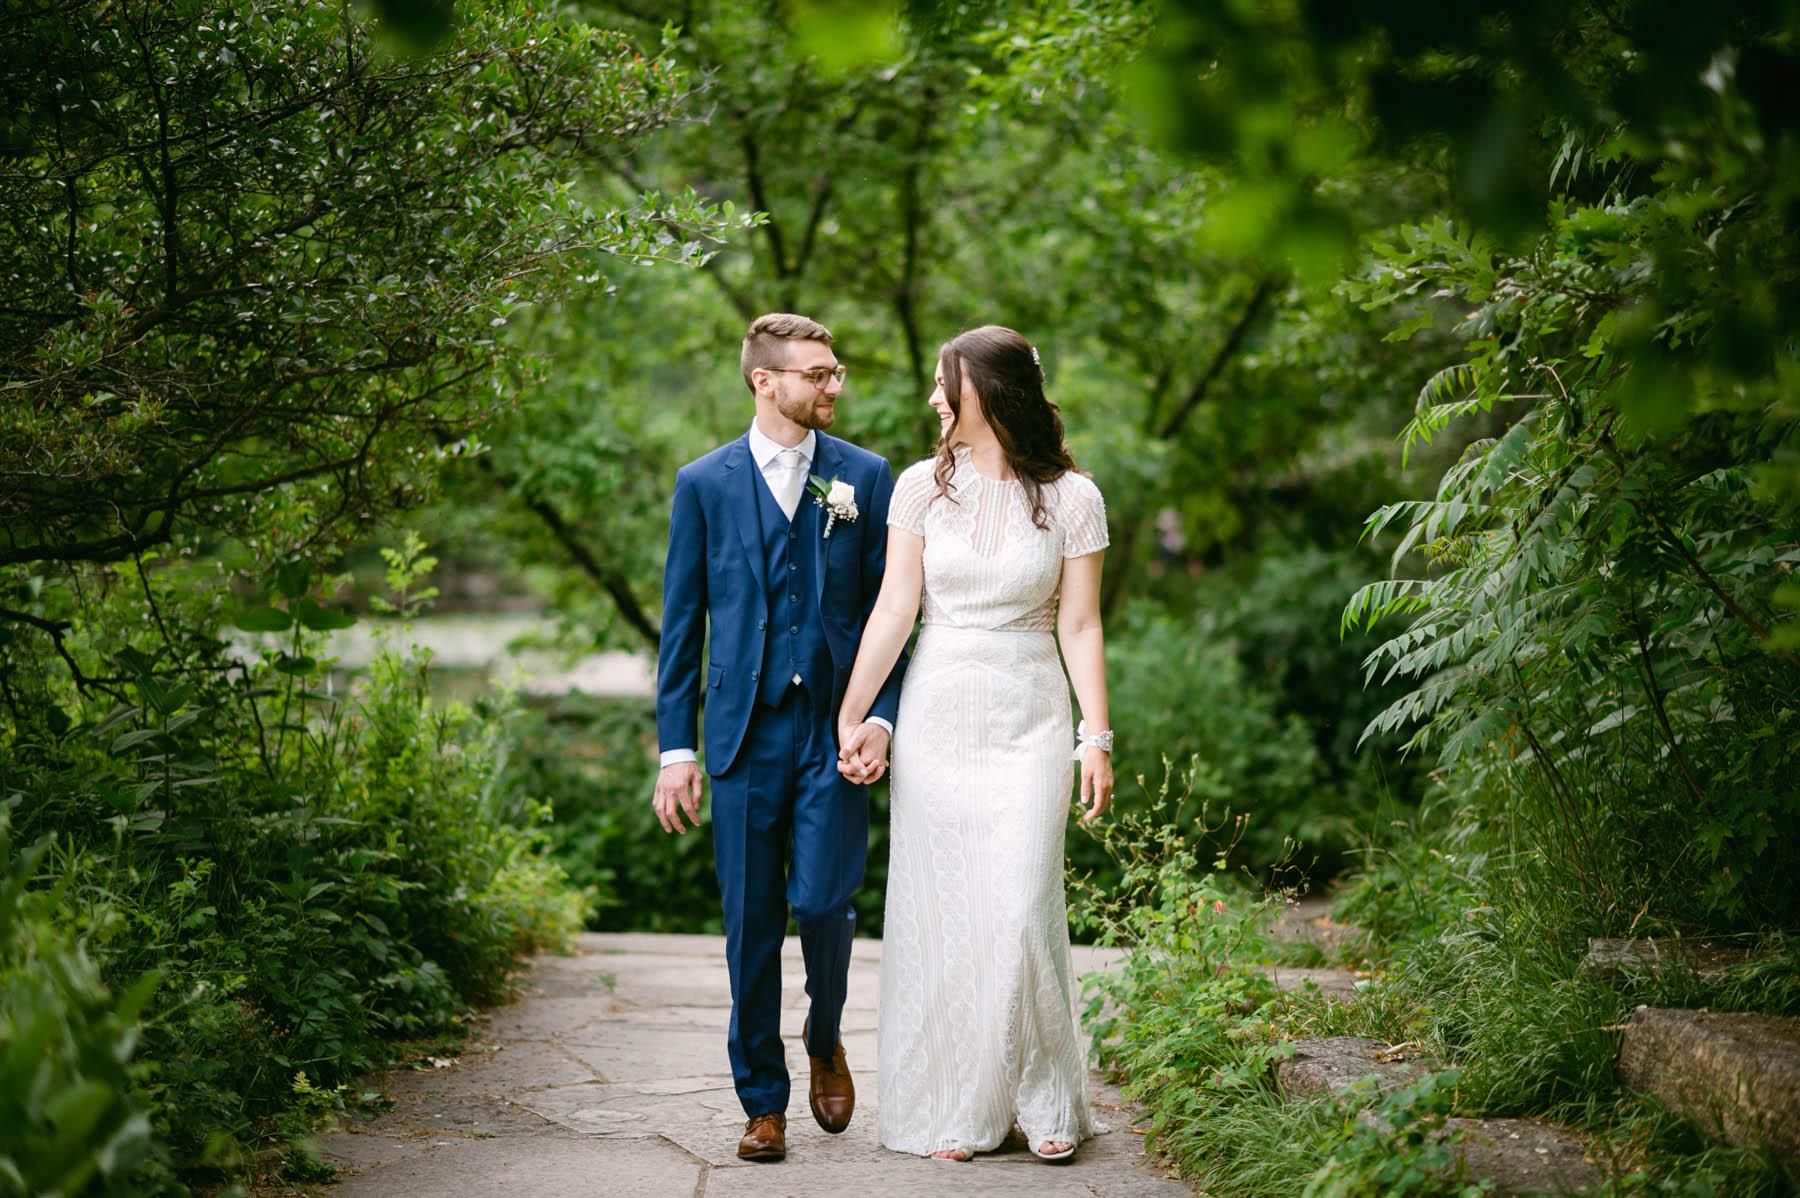 Lilly pond wedding